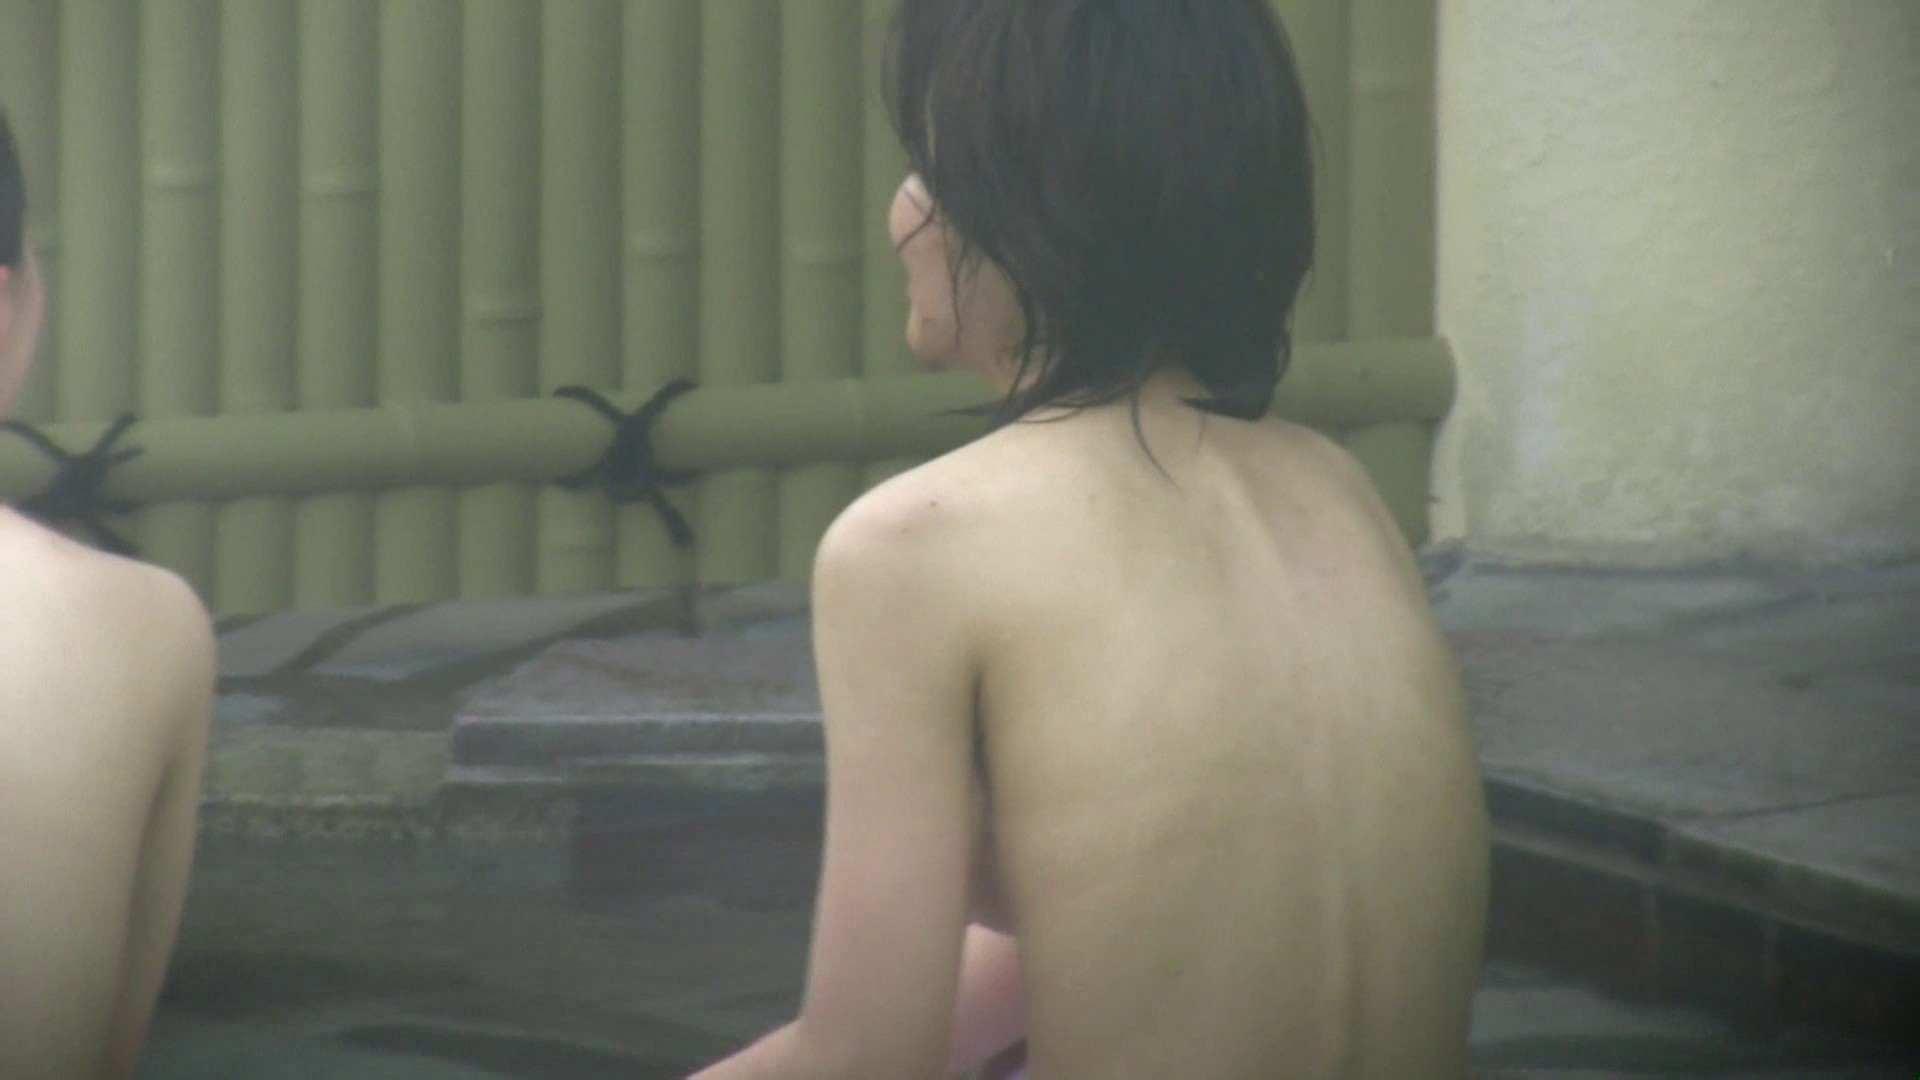 Aquaな露天風呂Vol.583 HなOL | 露天  81pic 75